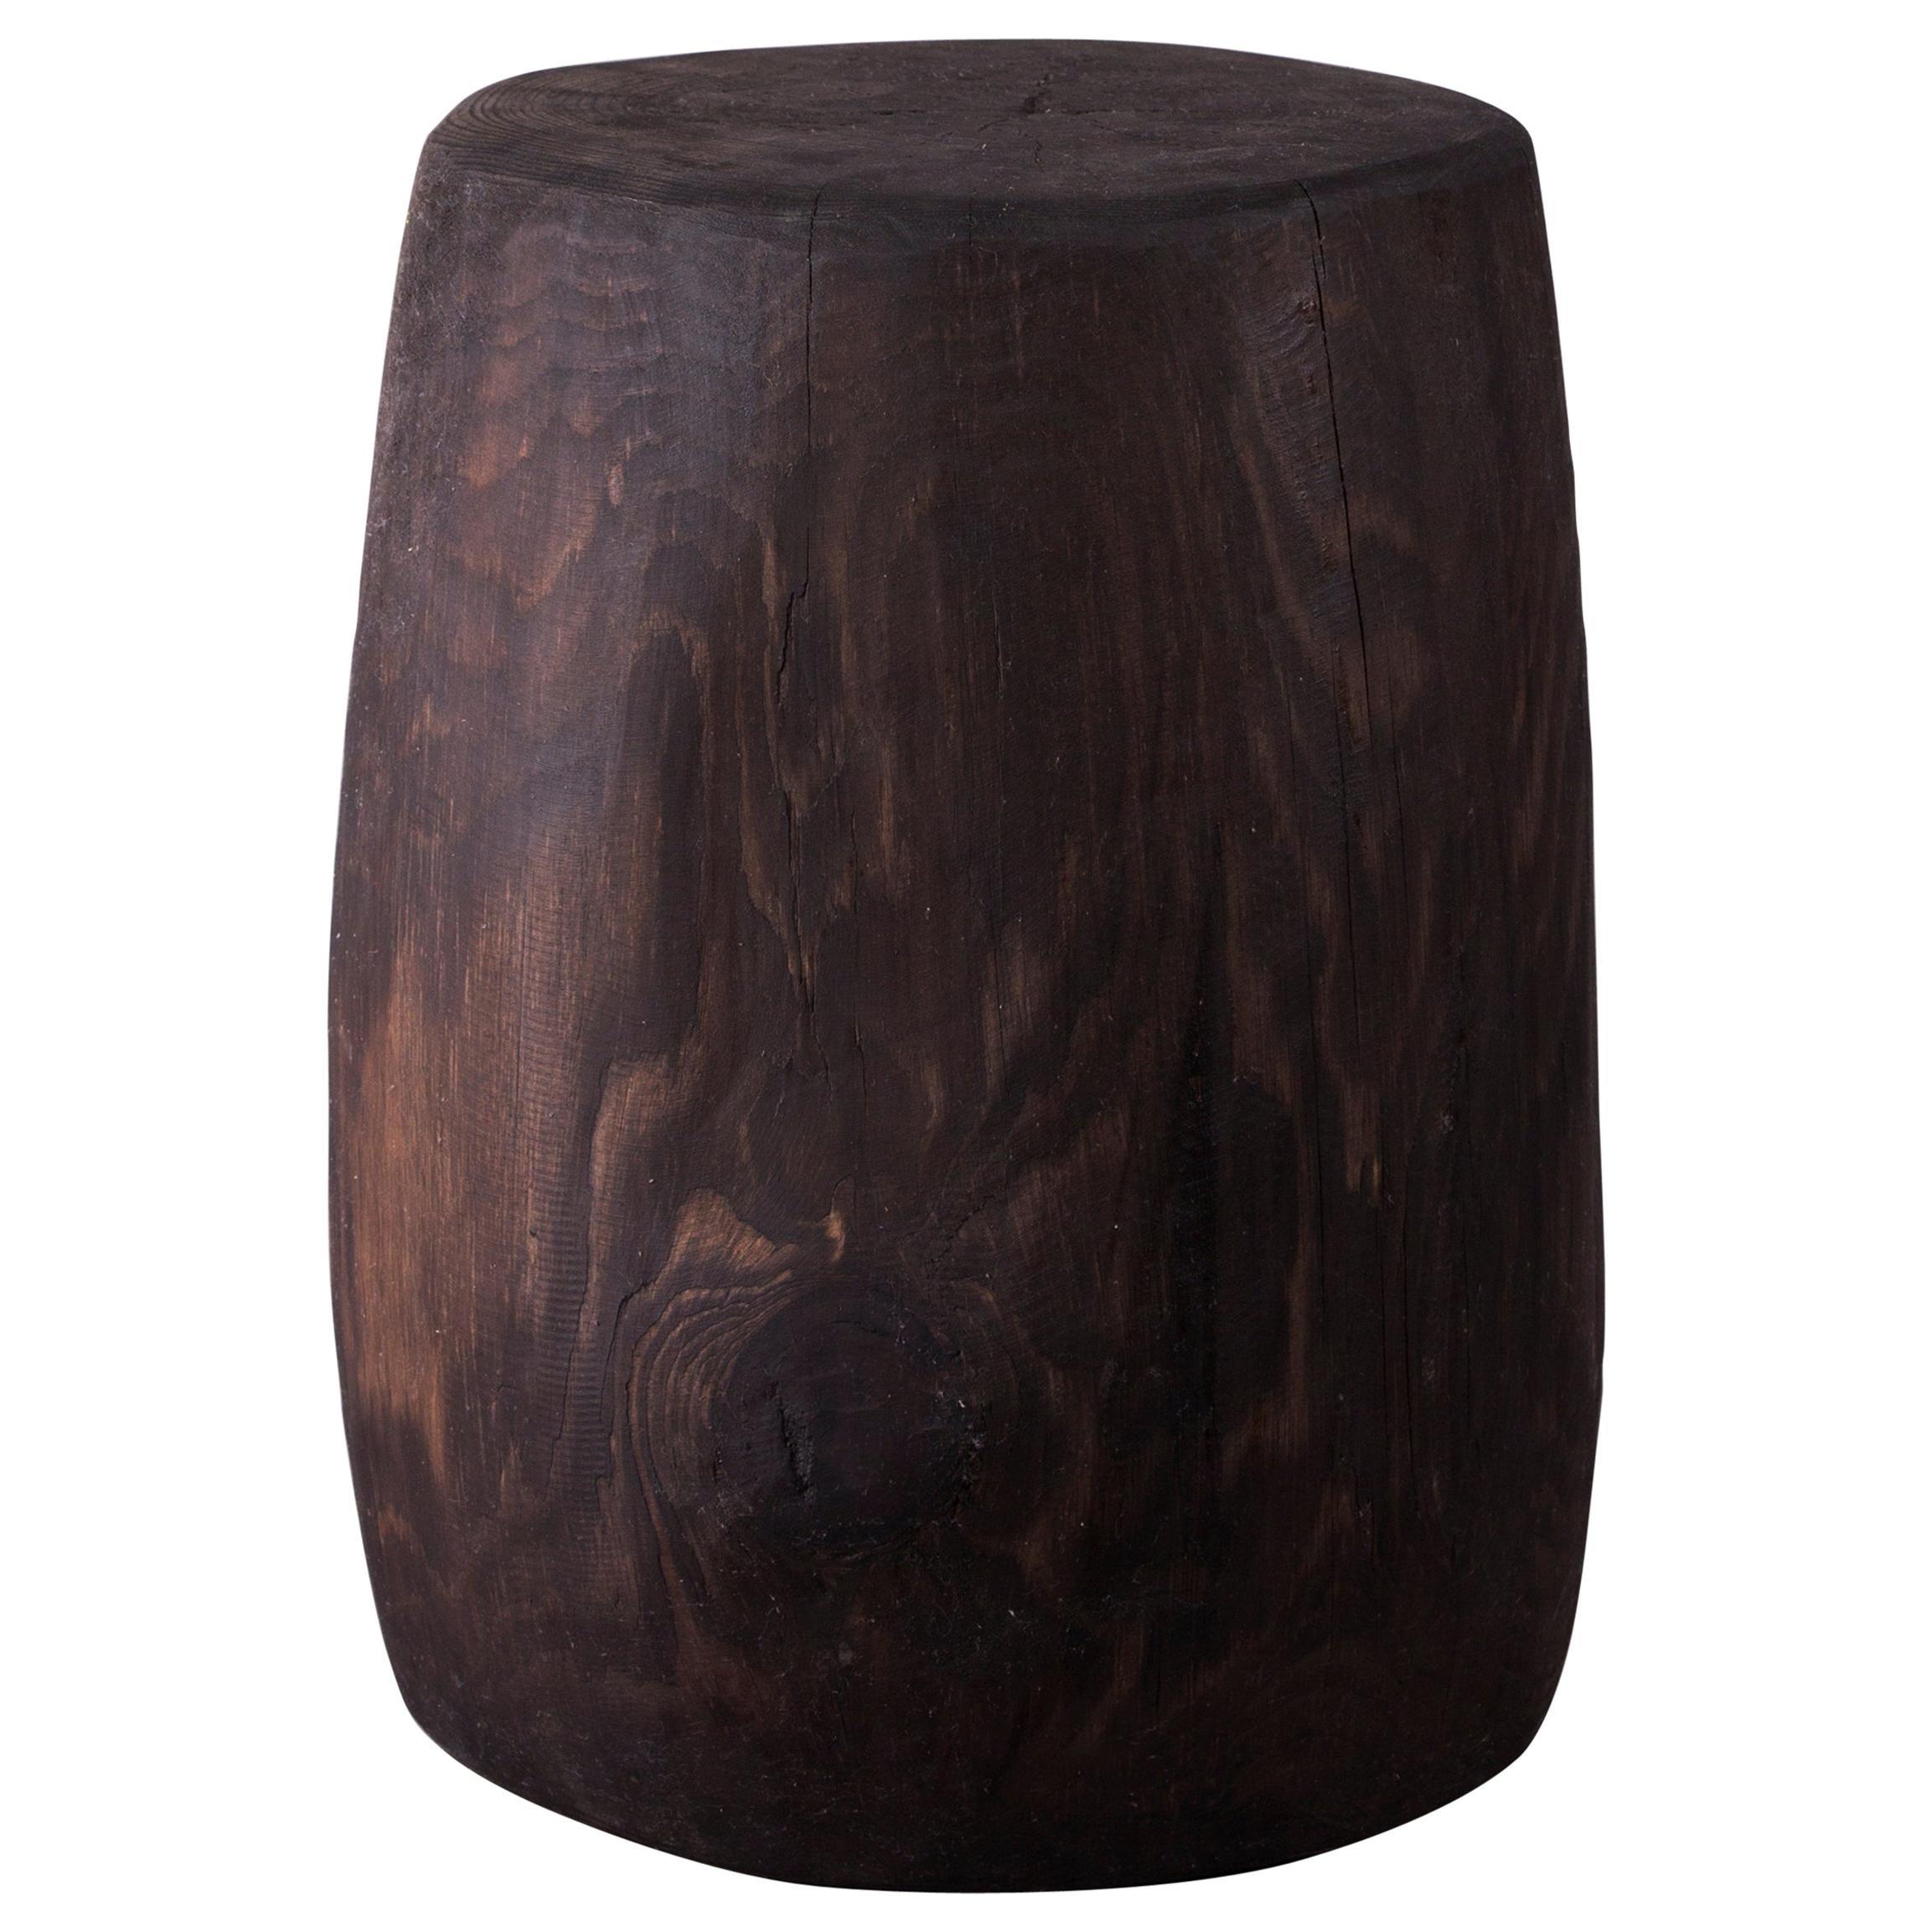 Kabuk Coffee Table by Rectangle Studio